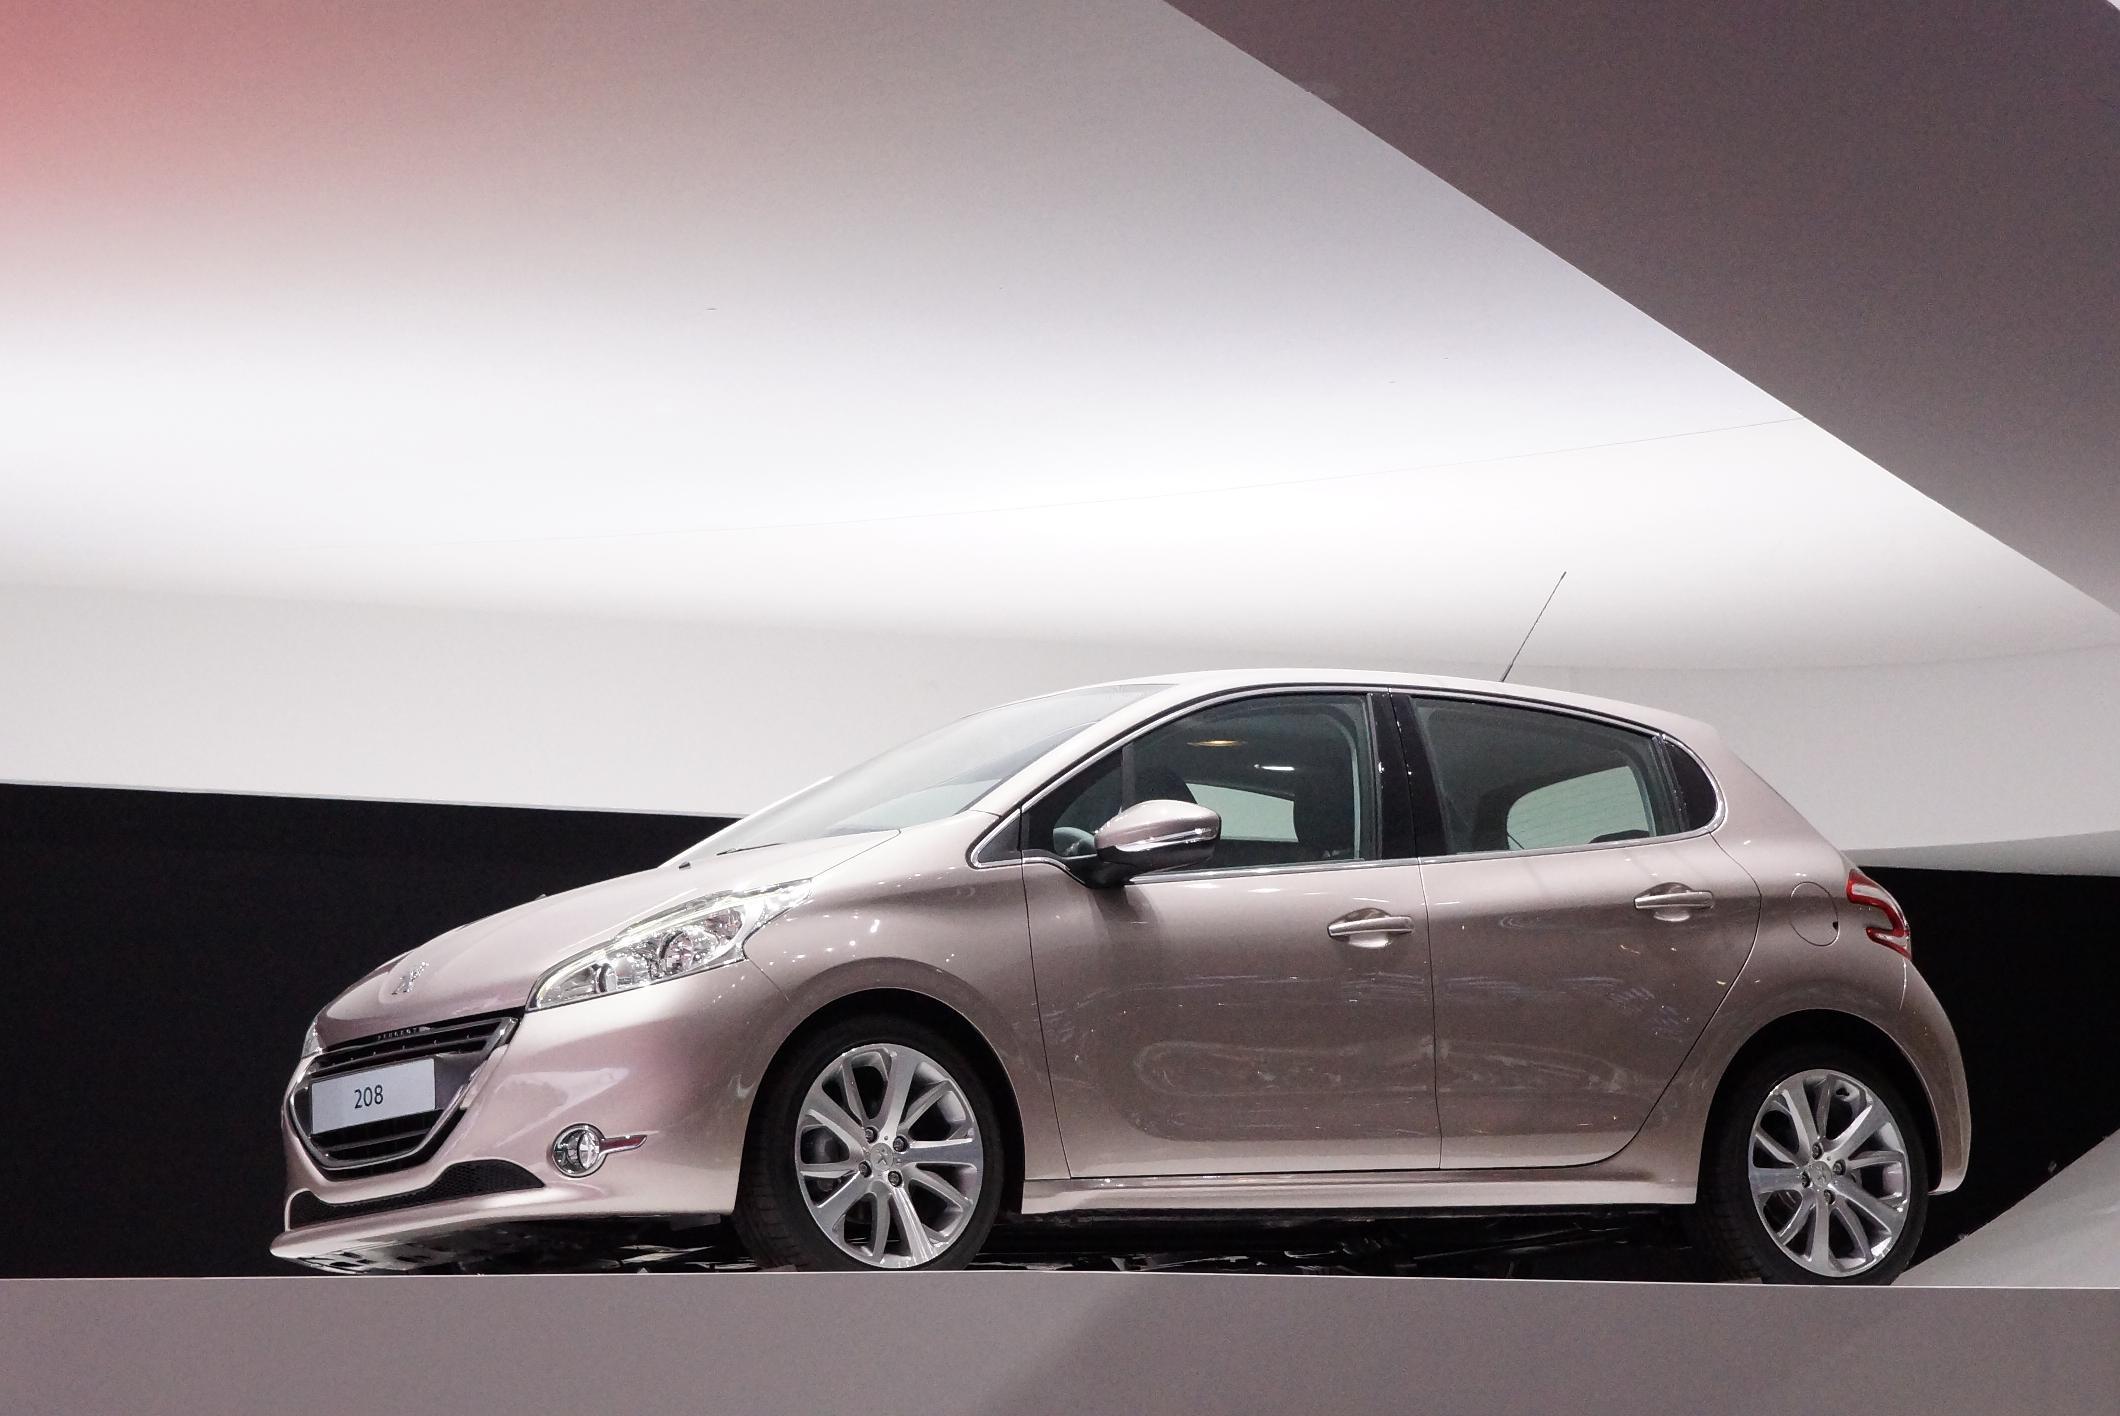 Peugeot 208 Geneva 2012